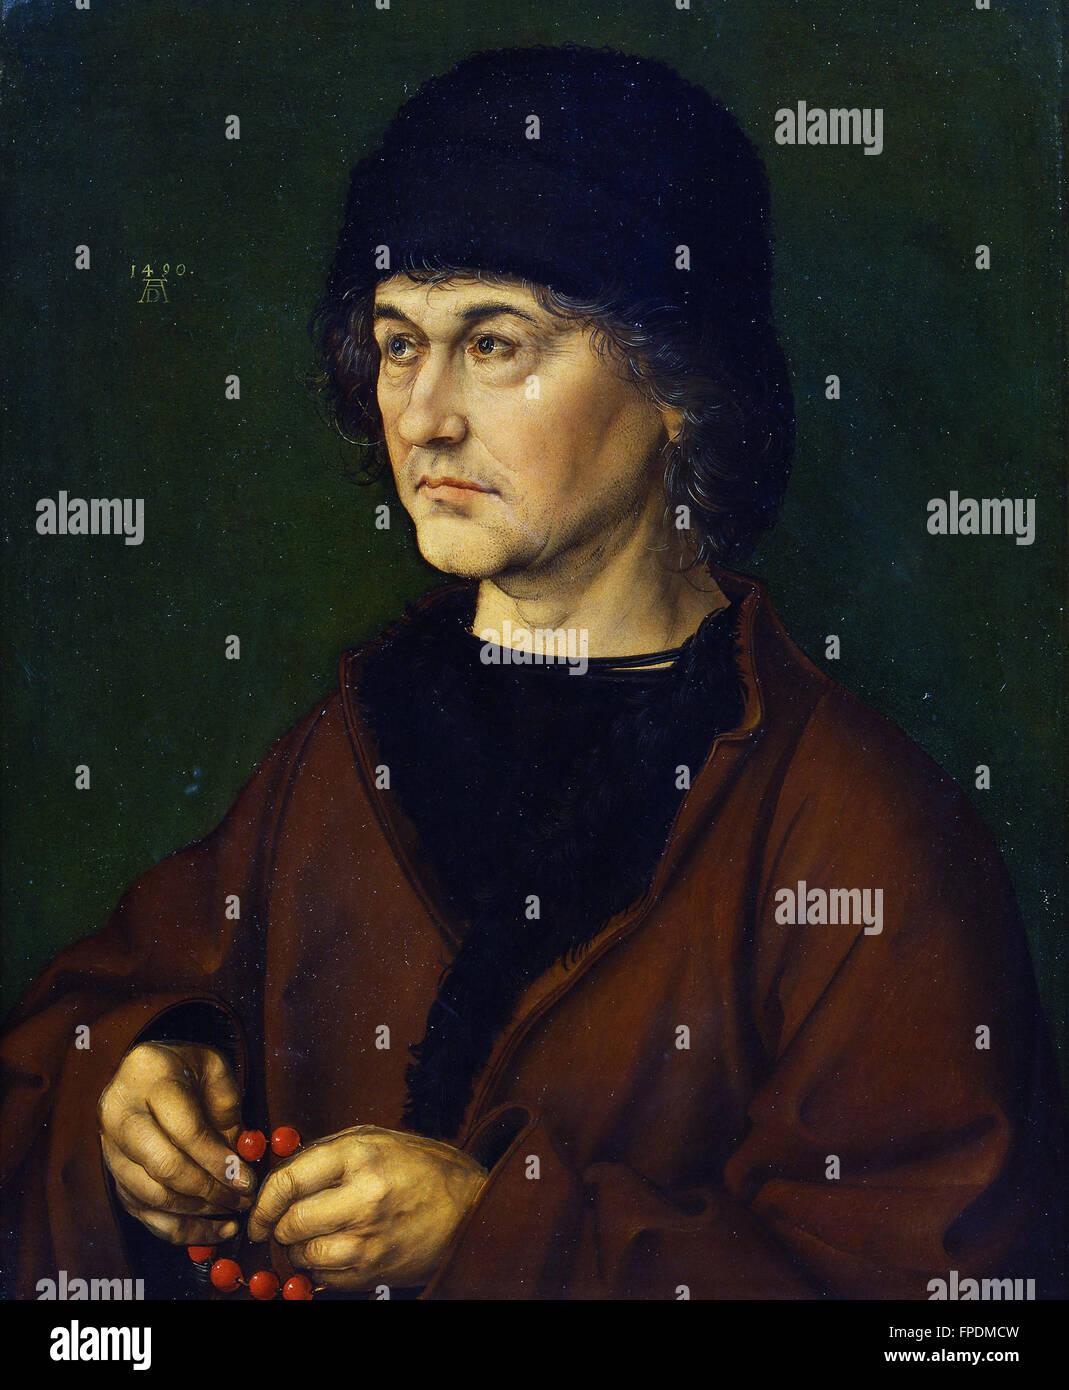 Albrecht Durer - Ritratto del padre - Stock Image